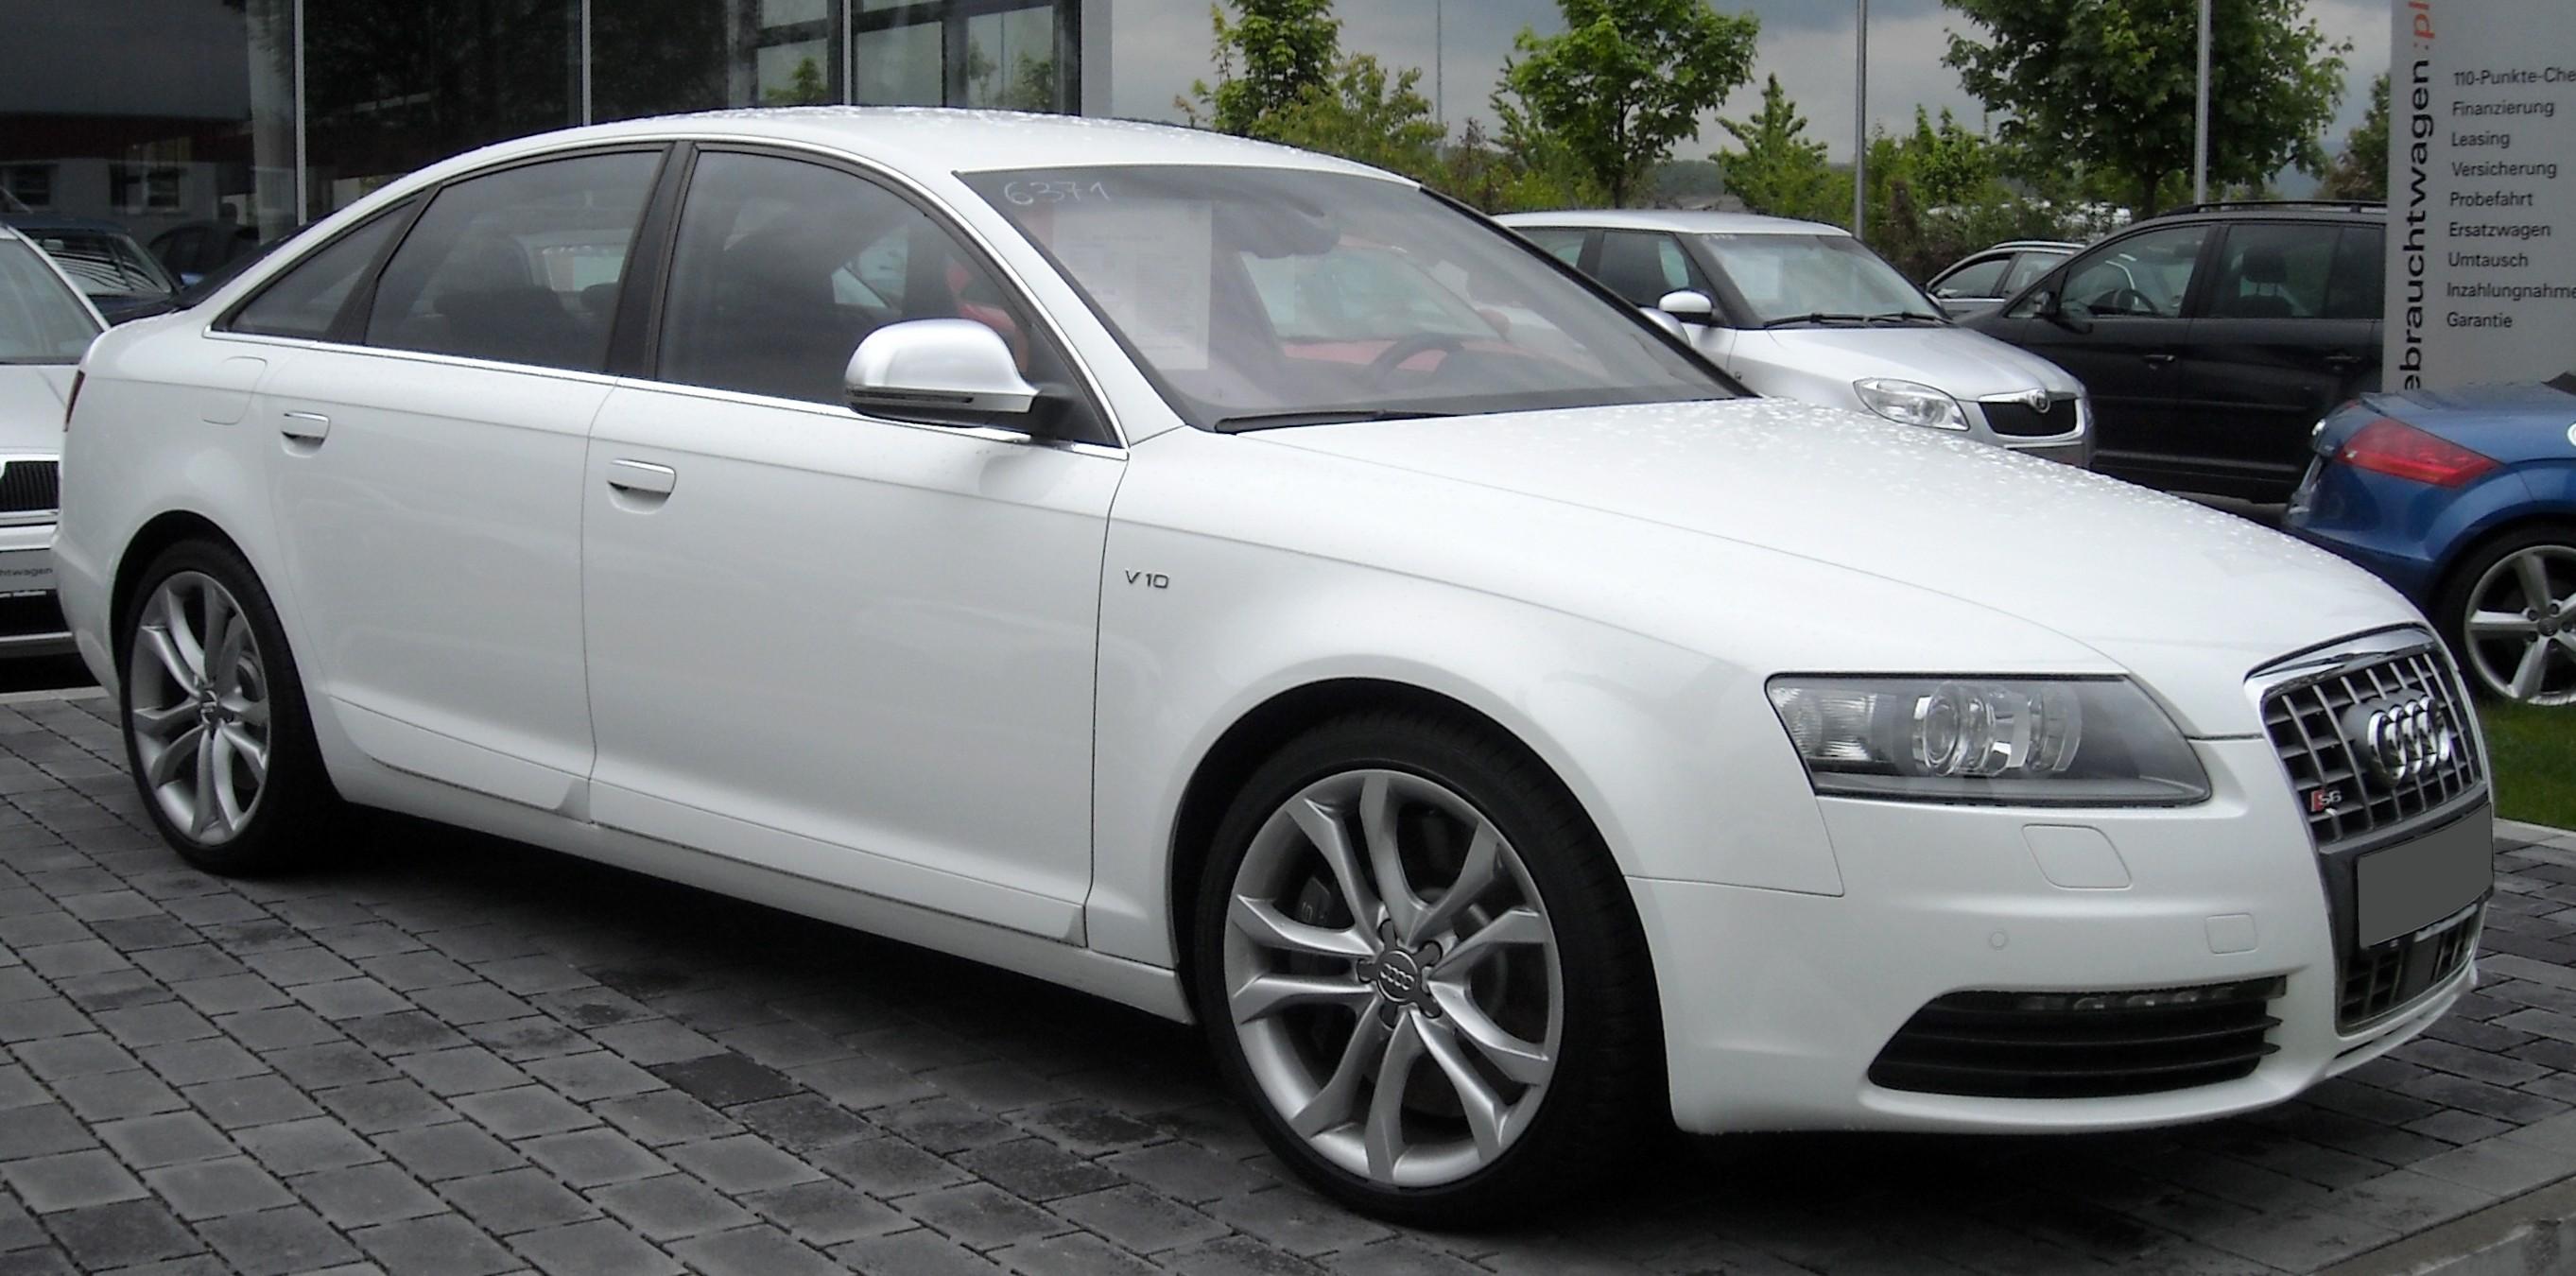 2010 Audi S6 Image 13